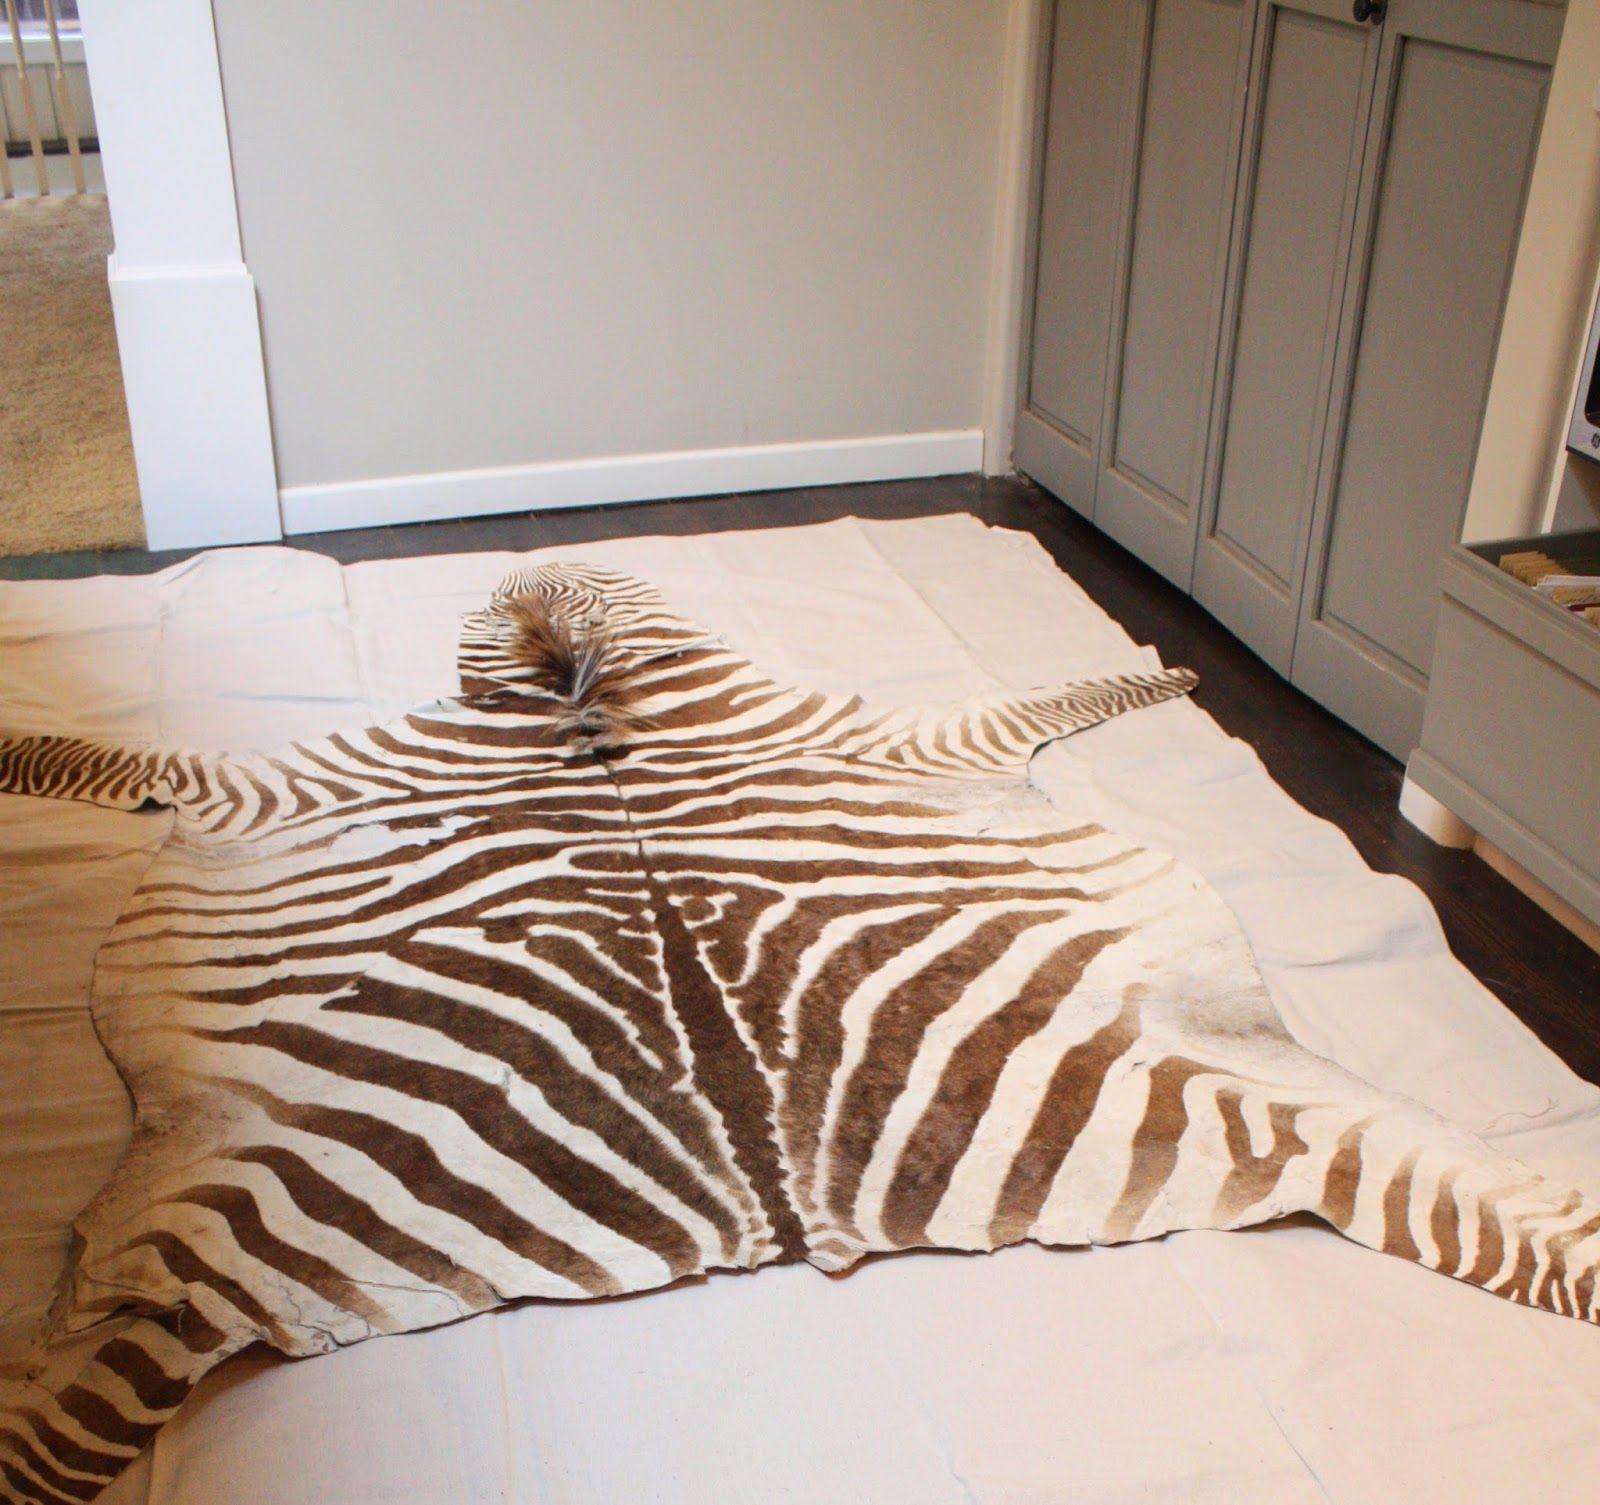 15 Diy Faux Zebra Rug Thrifty Thursday Cow Hide